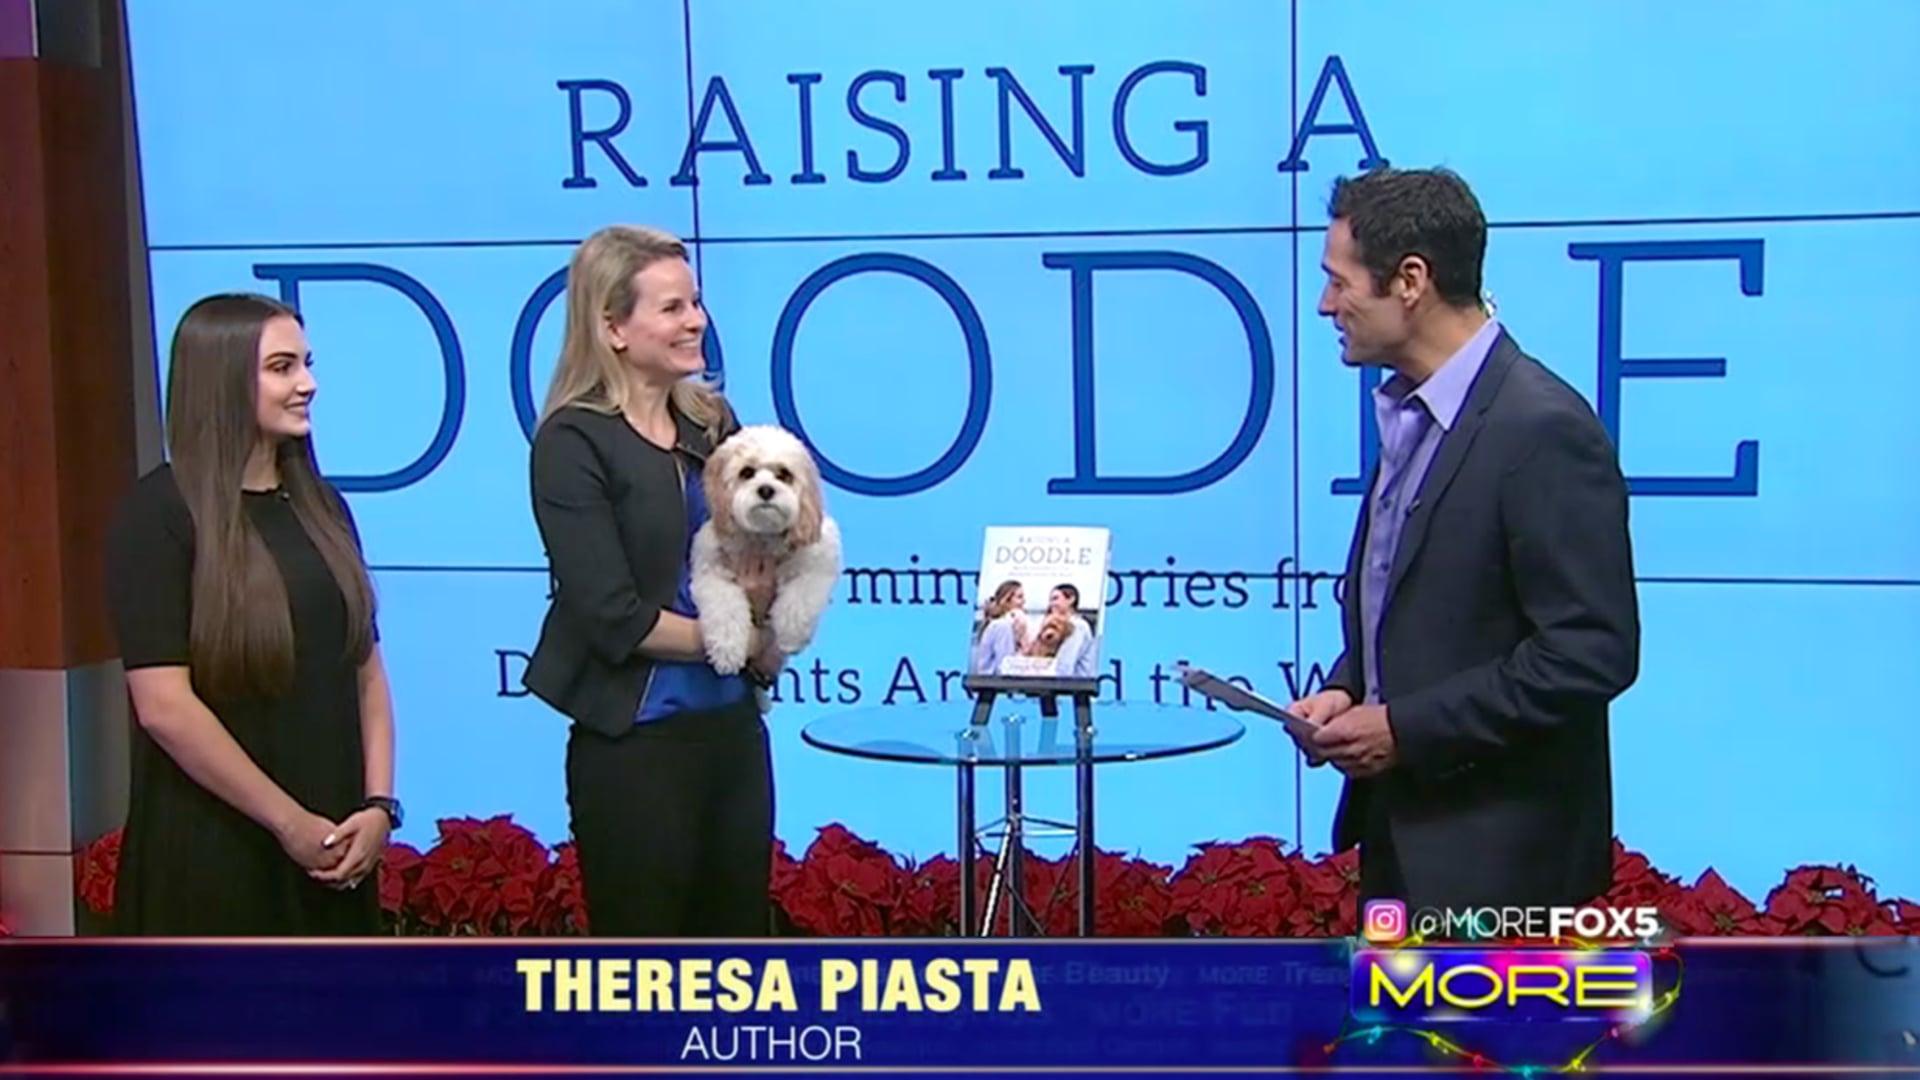 Theresa Piasta on FOX5 MORE Show – Las Vegas, NV on Dec 04, 2019